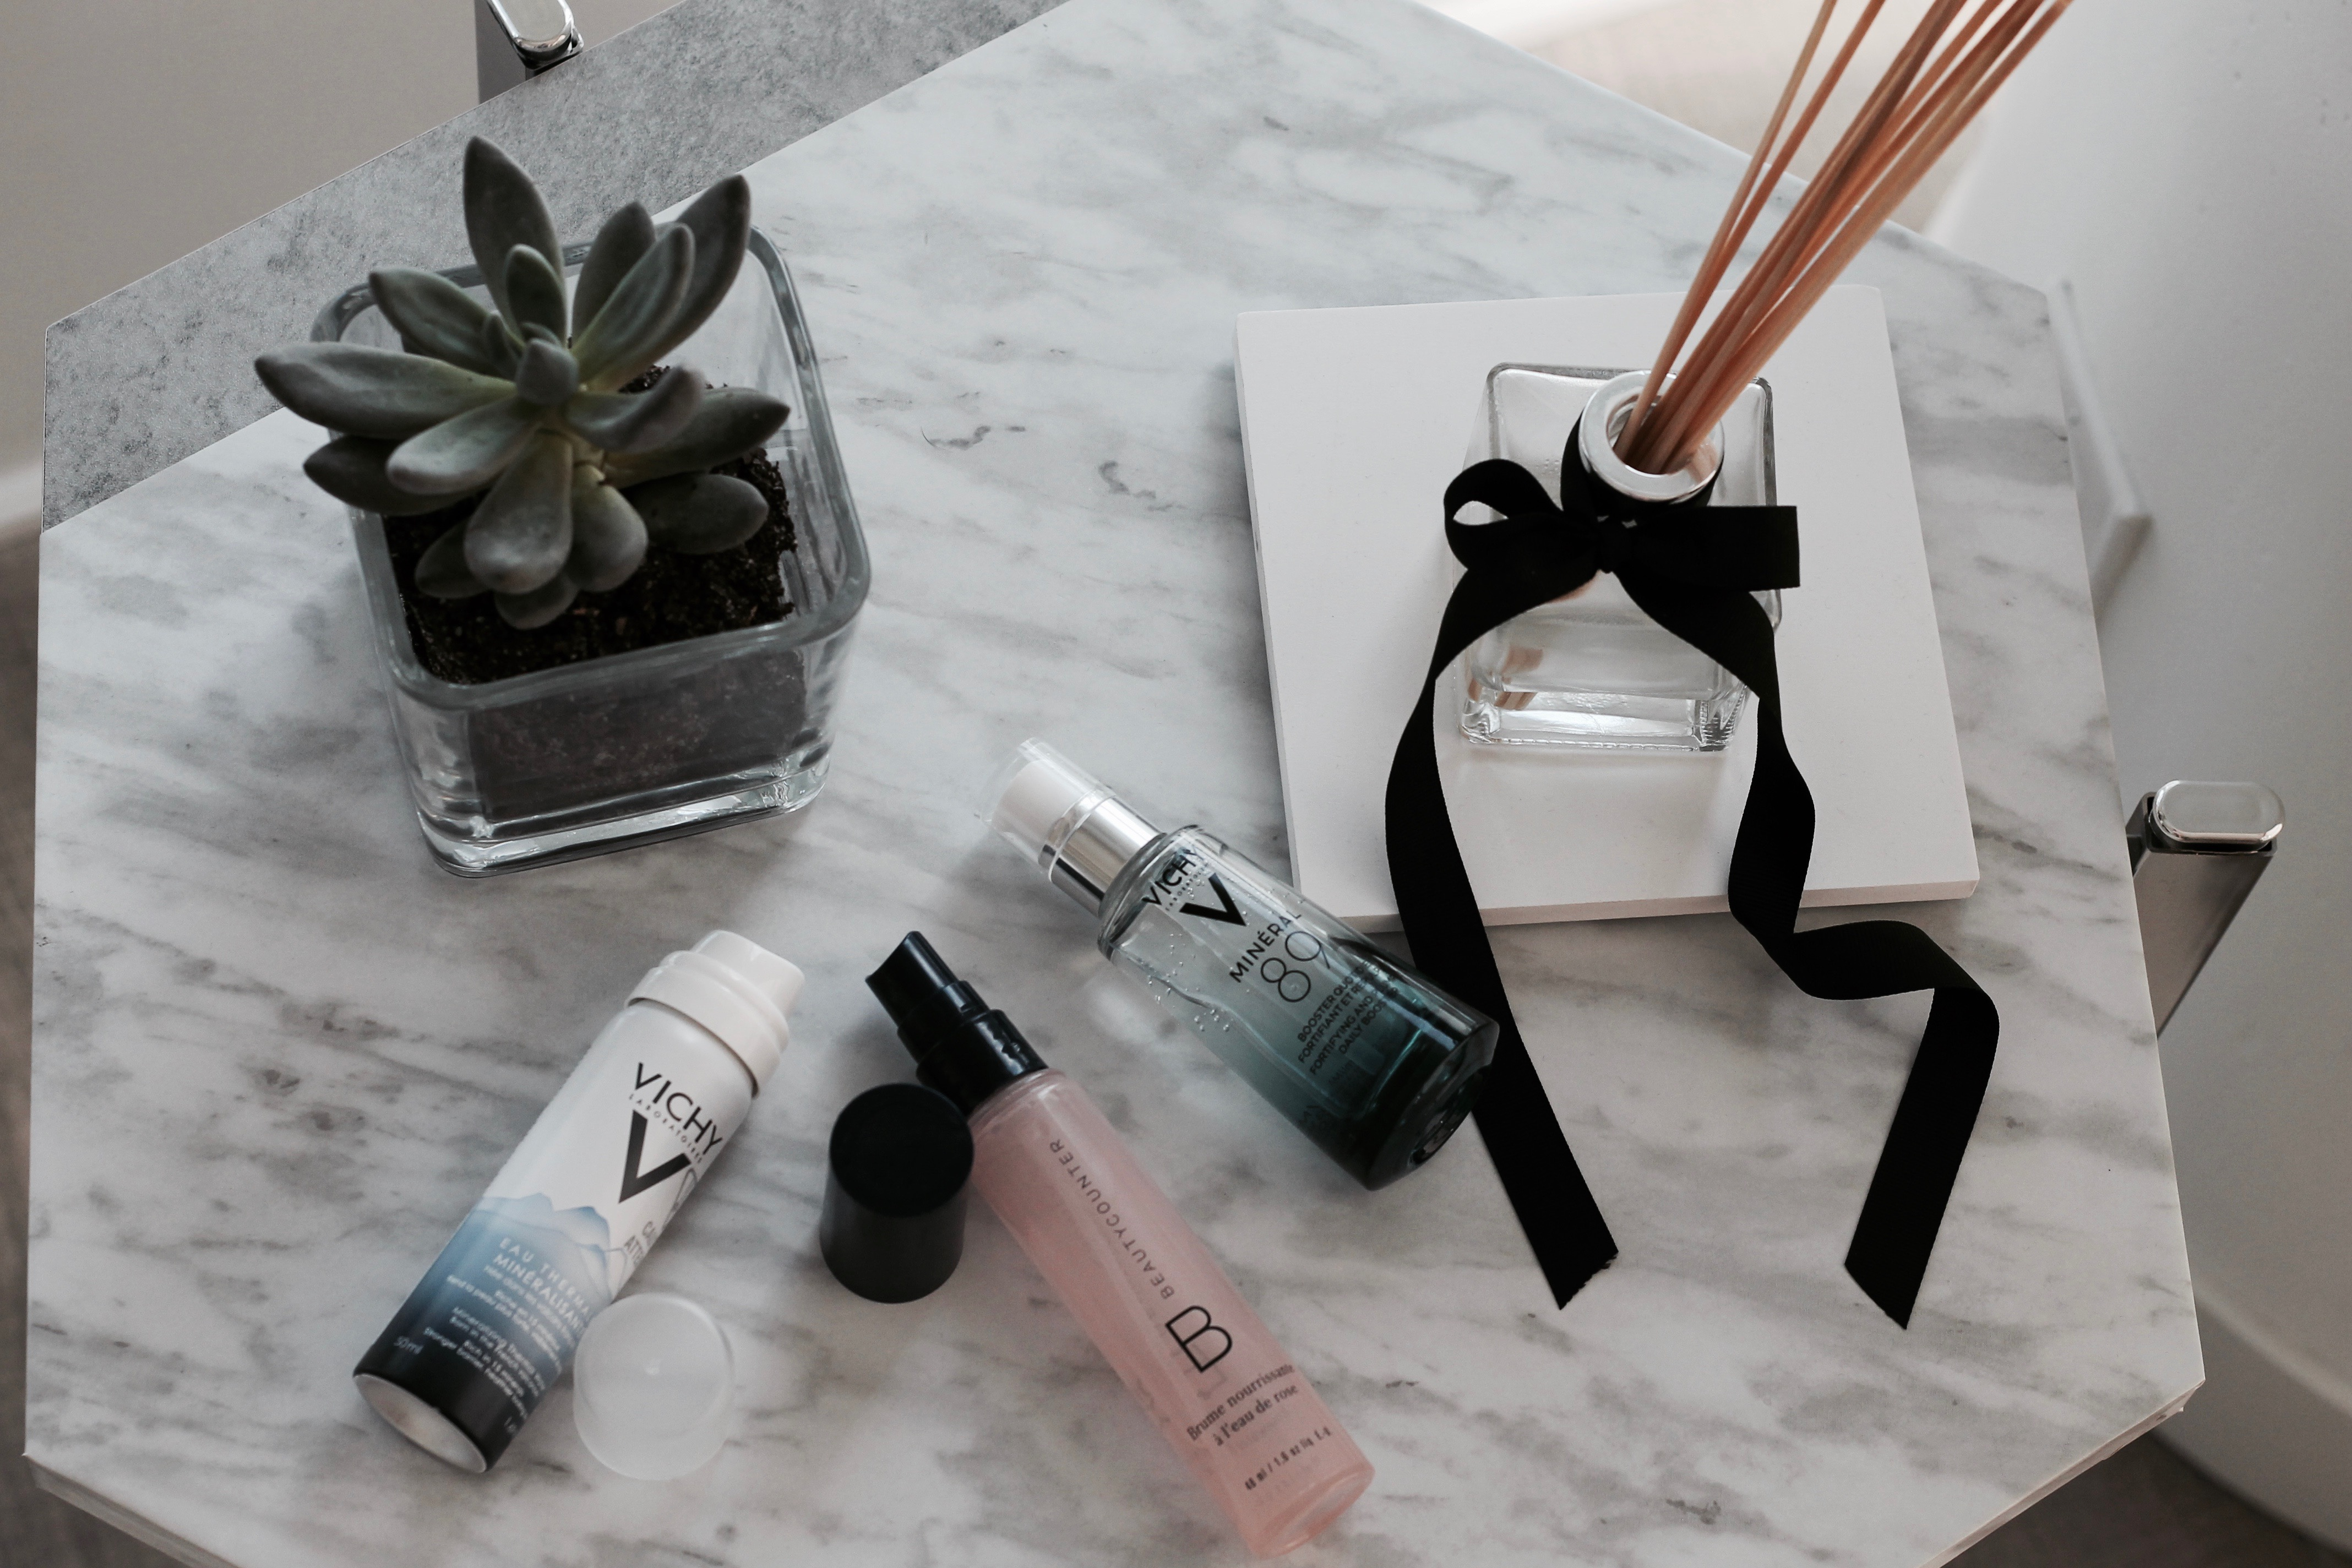 MON MODE Blog | Mon Mode | Fashion Blog | Toronto Blogger |Summer Skincare Routine | Vichy Mineral Water | Face mist